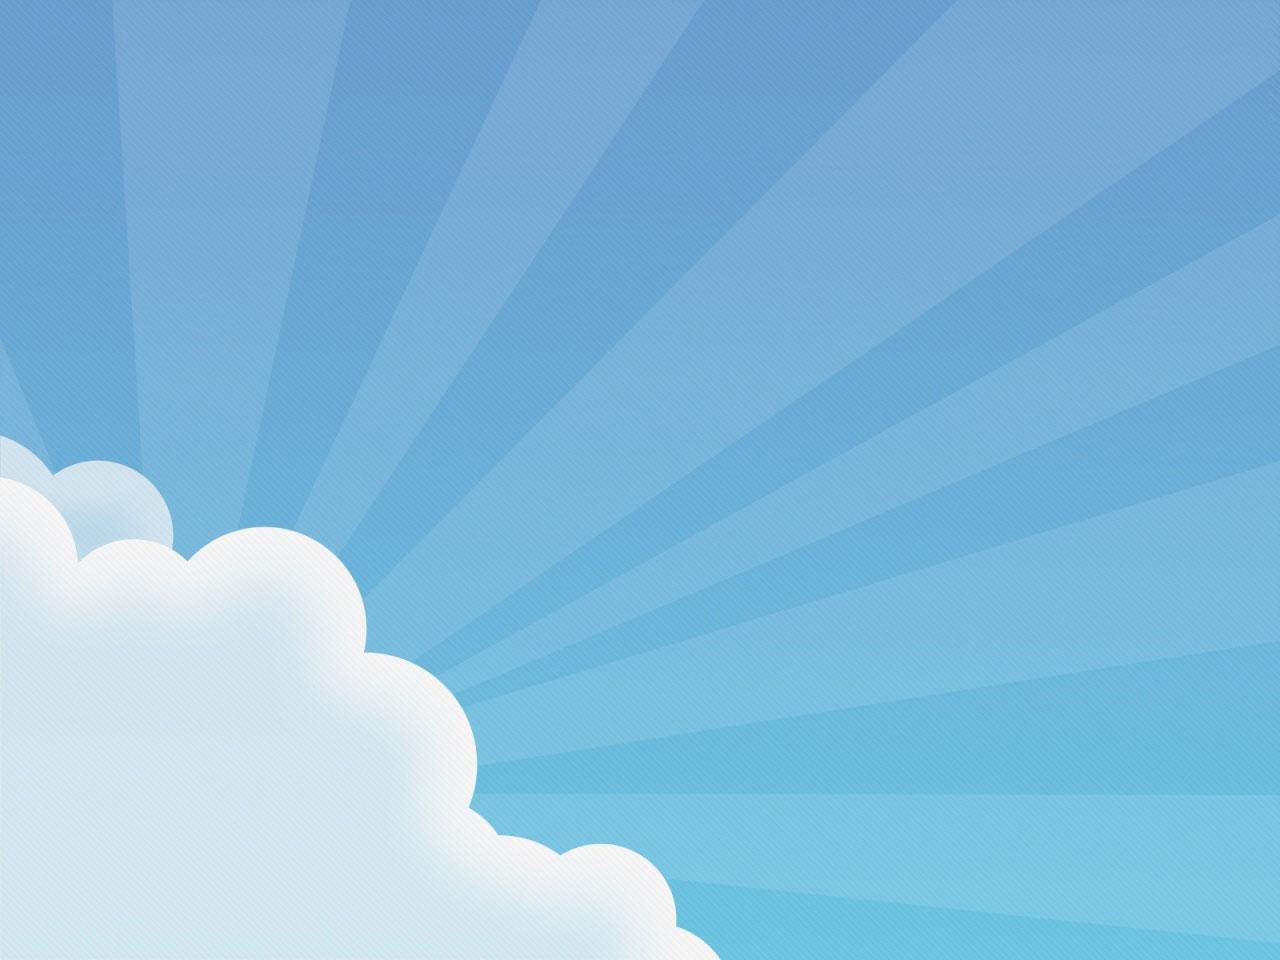 Cloud_bg